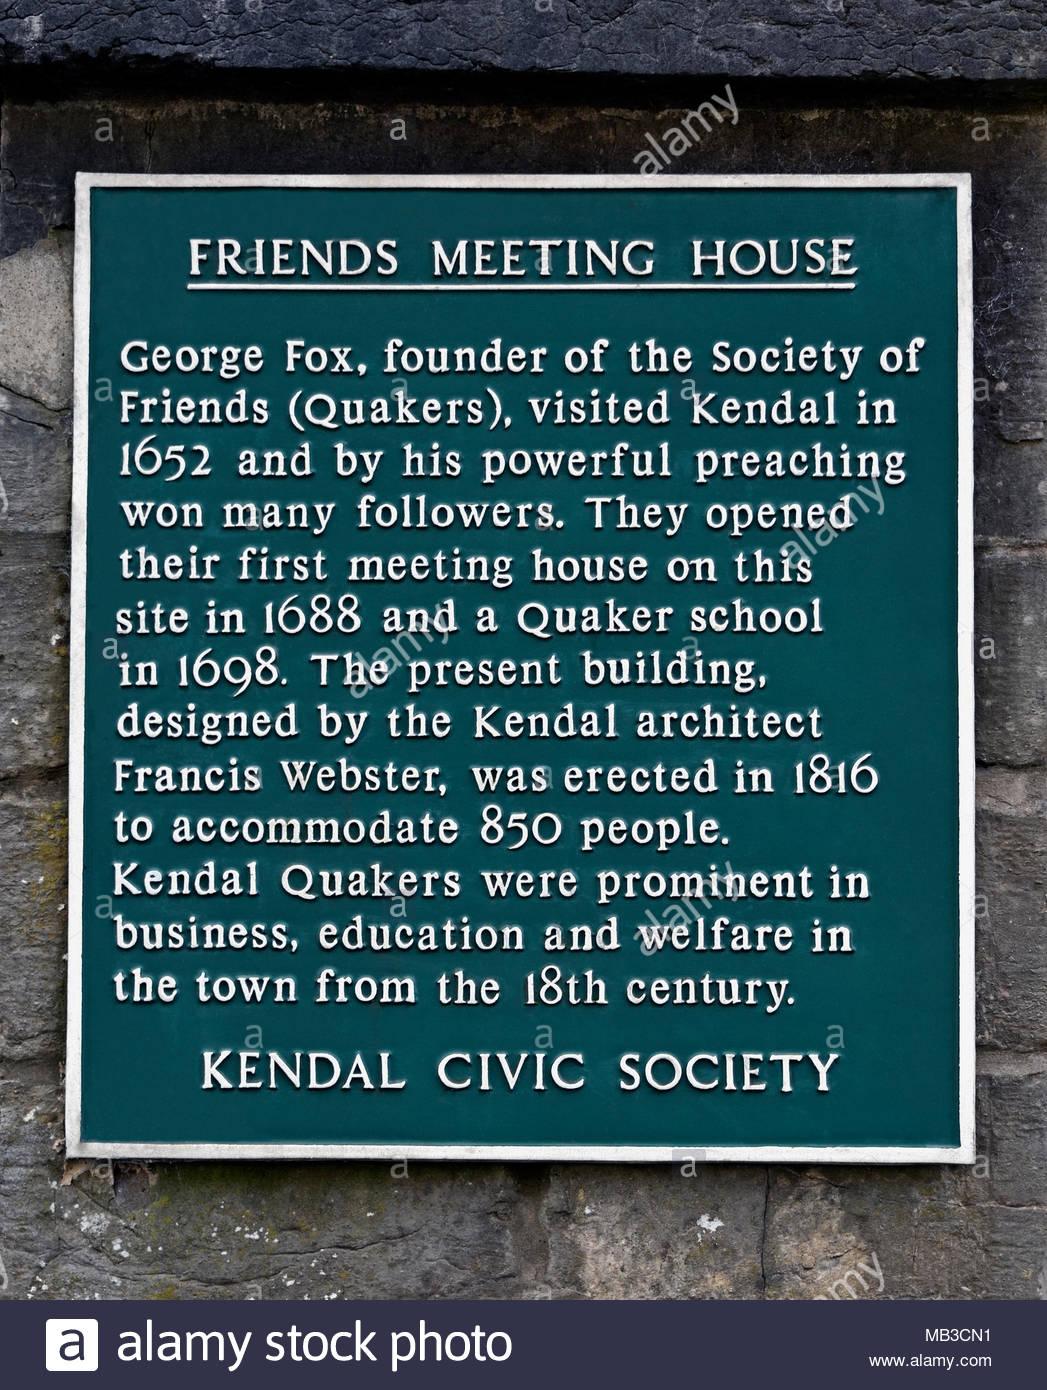 Friends Meeting House. Descriptive plaque, Kendal Civic Society. Stramongate, Kendal, Cumbria, England, United Kingdom, Europe. - Stock Image